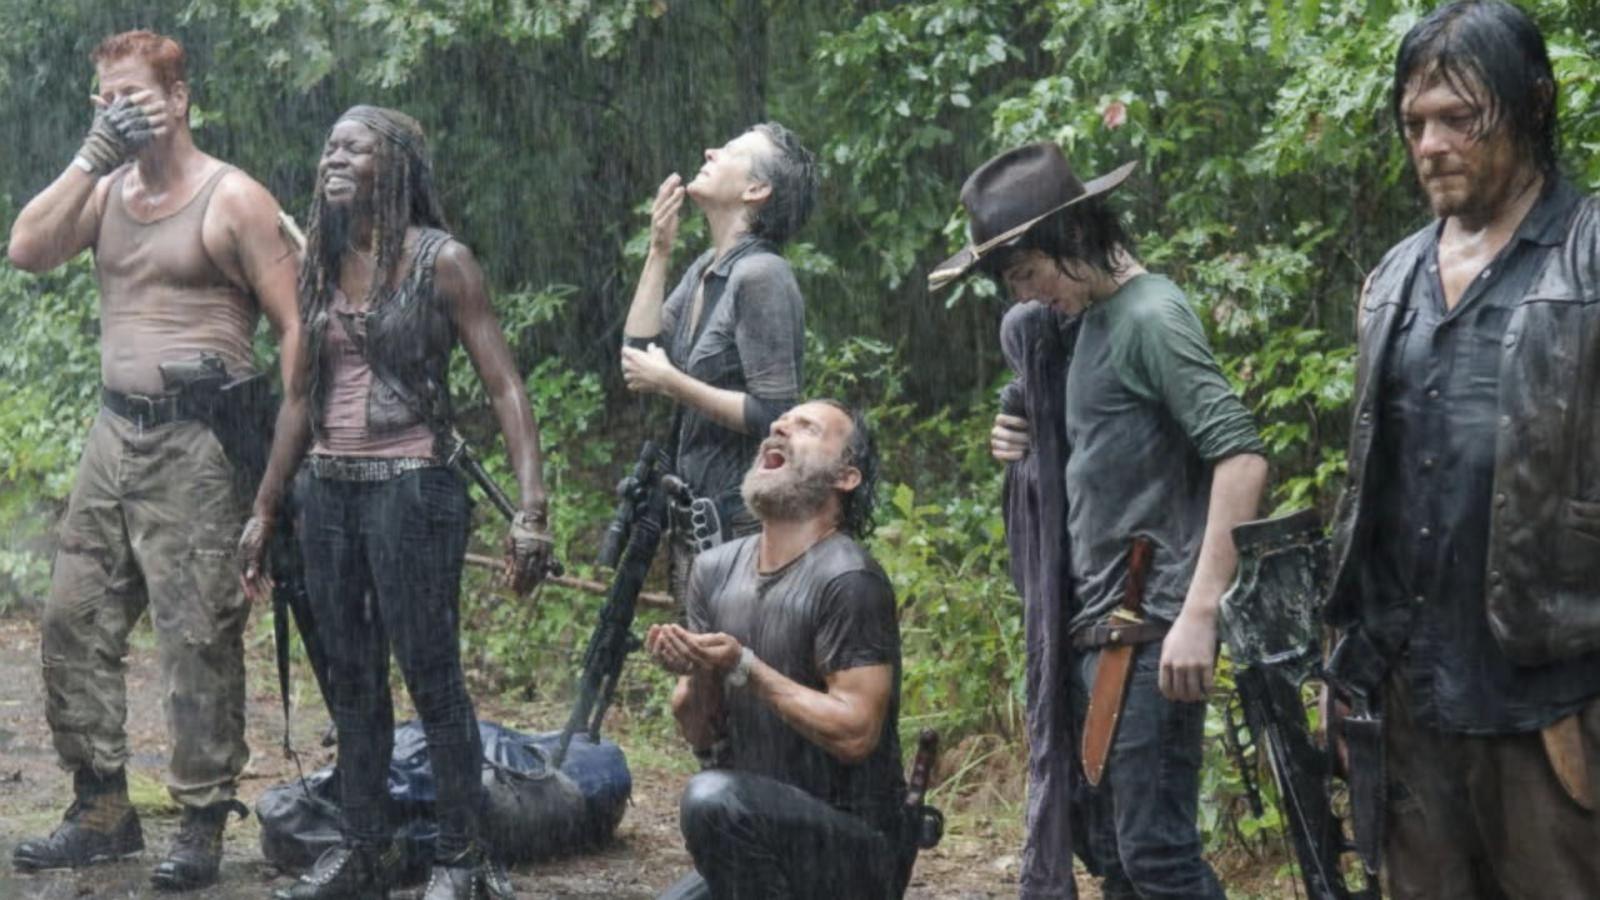 VIDEO: 'Walking Dead' Co-Creator Files $280M Lawsuit Against AMC